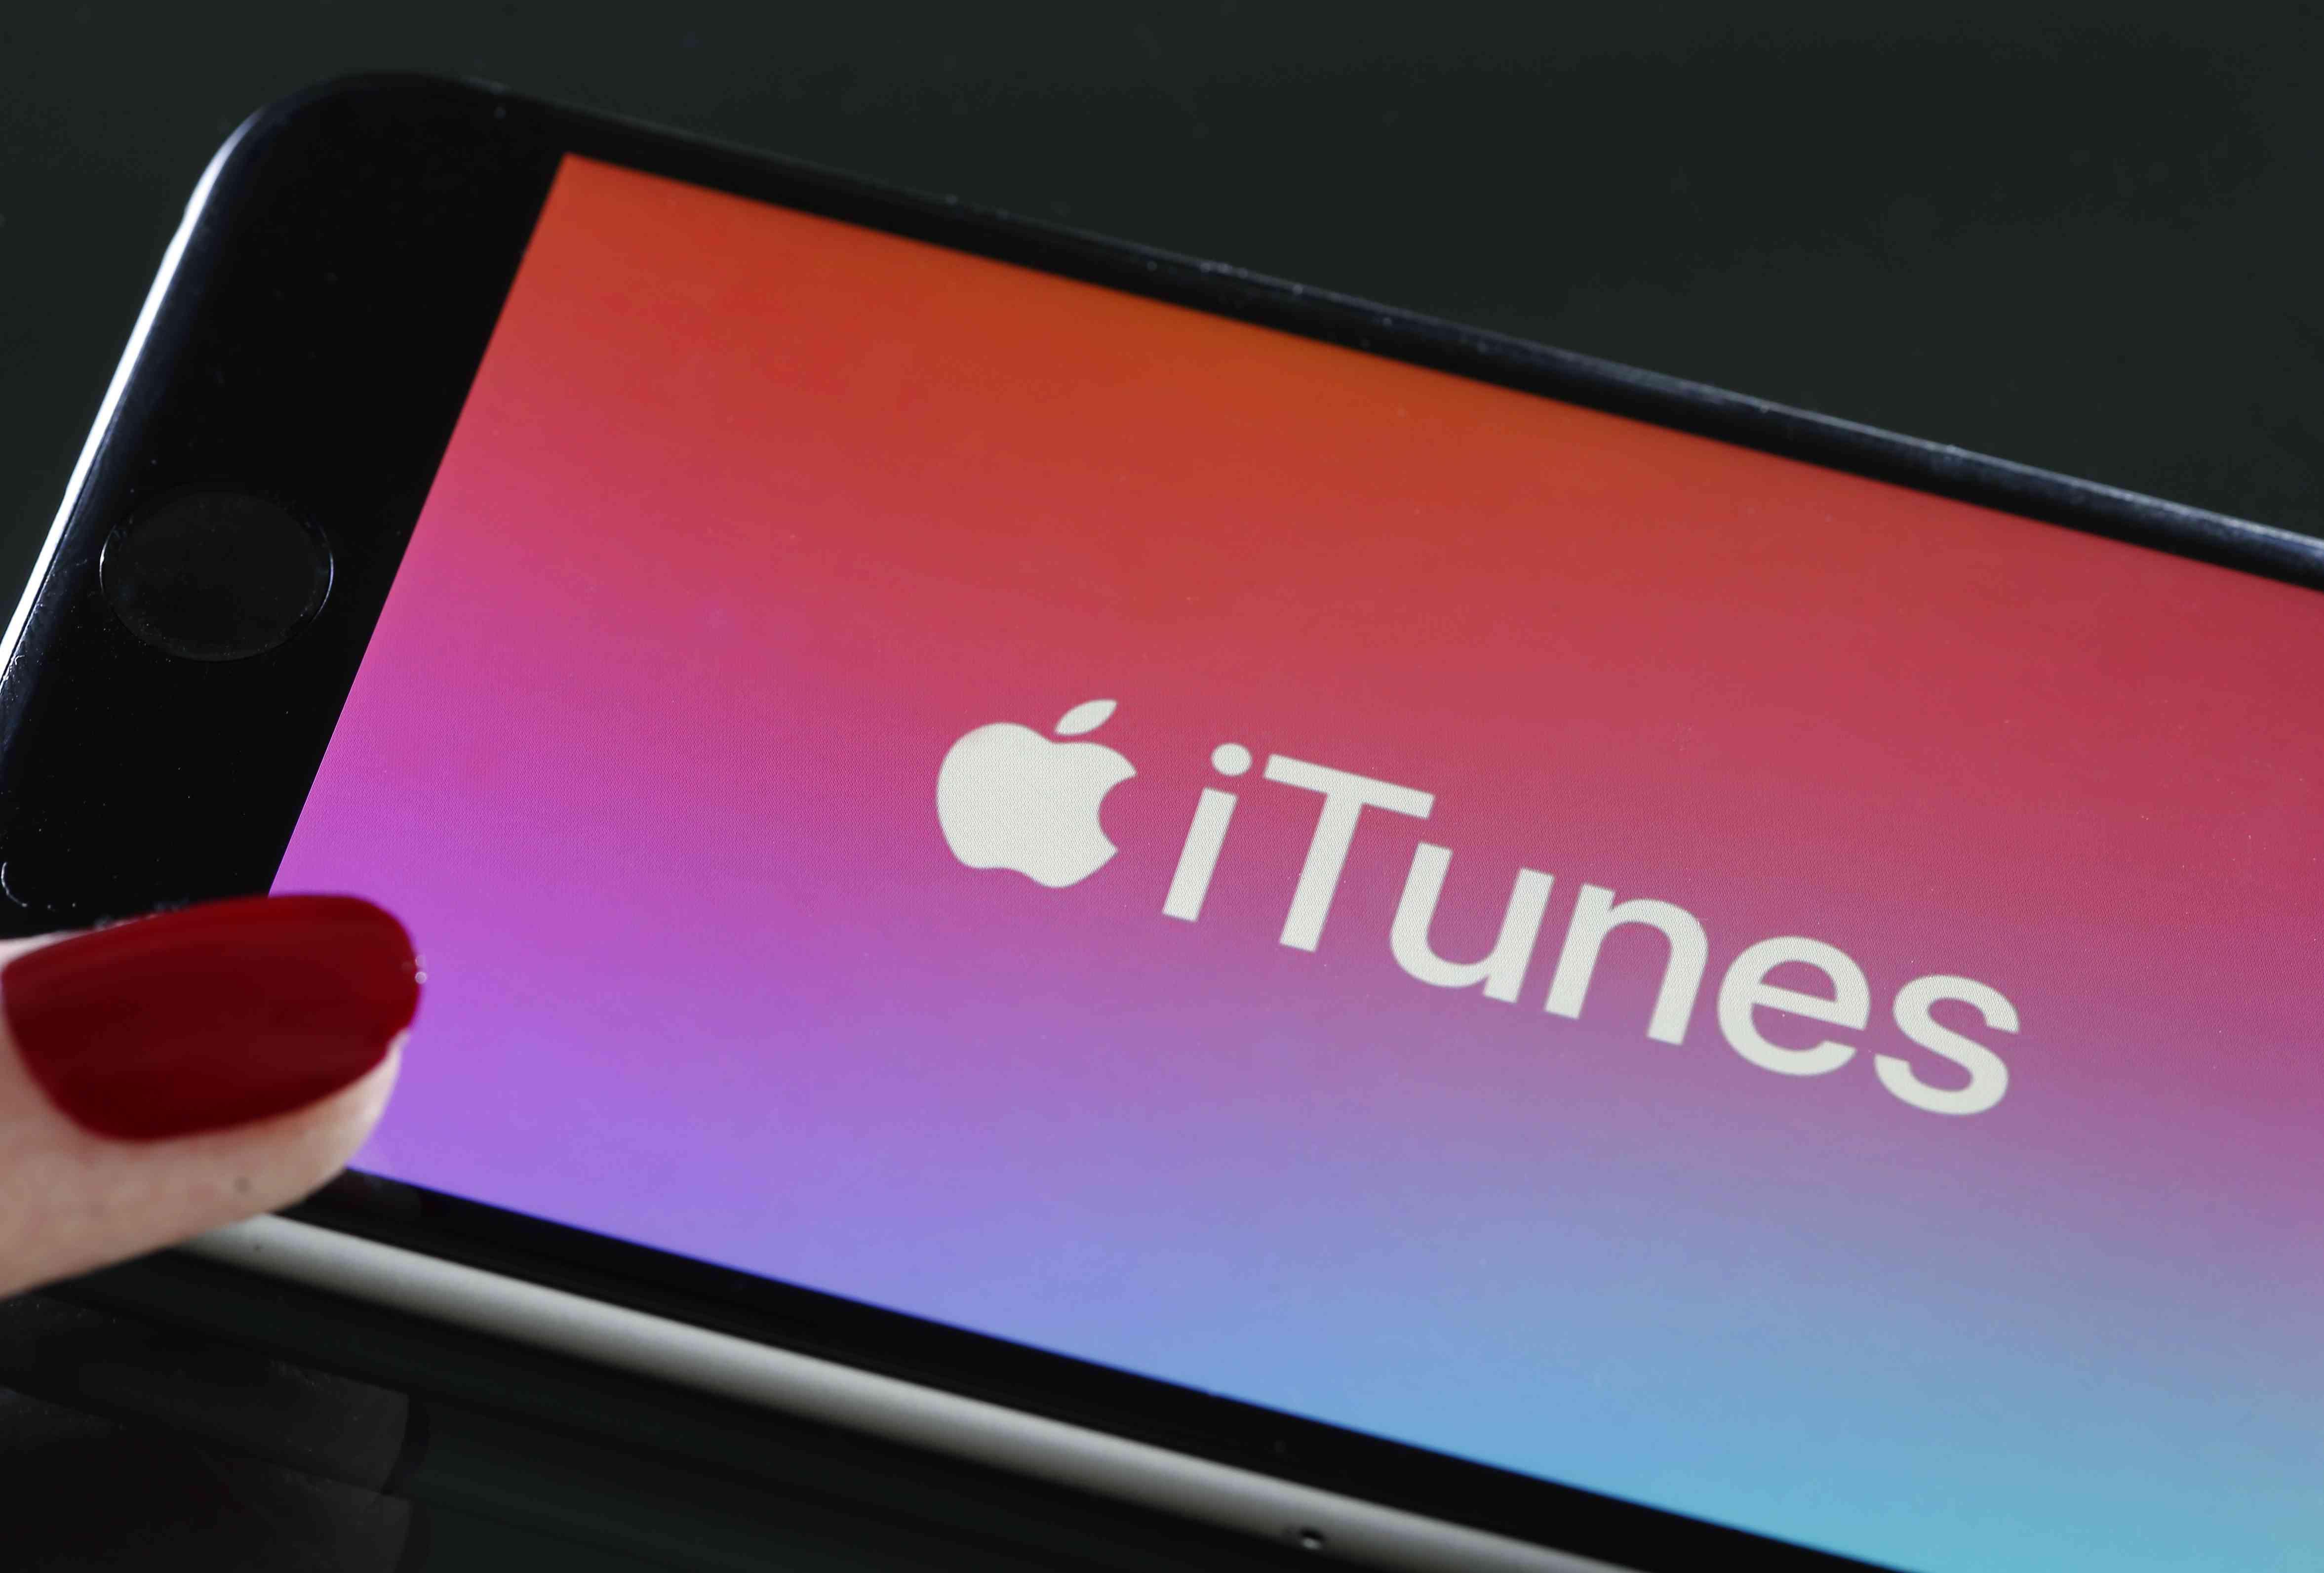 iTunes logo on smartphone.